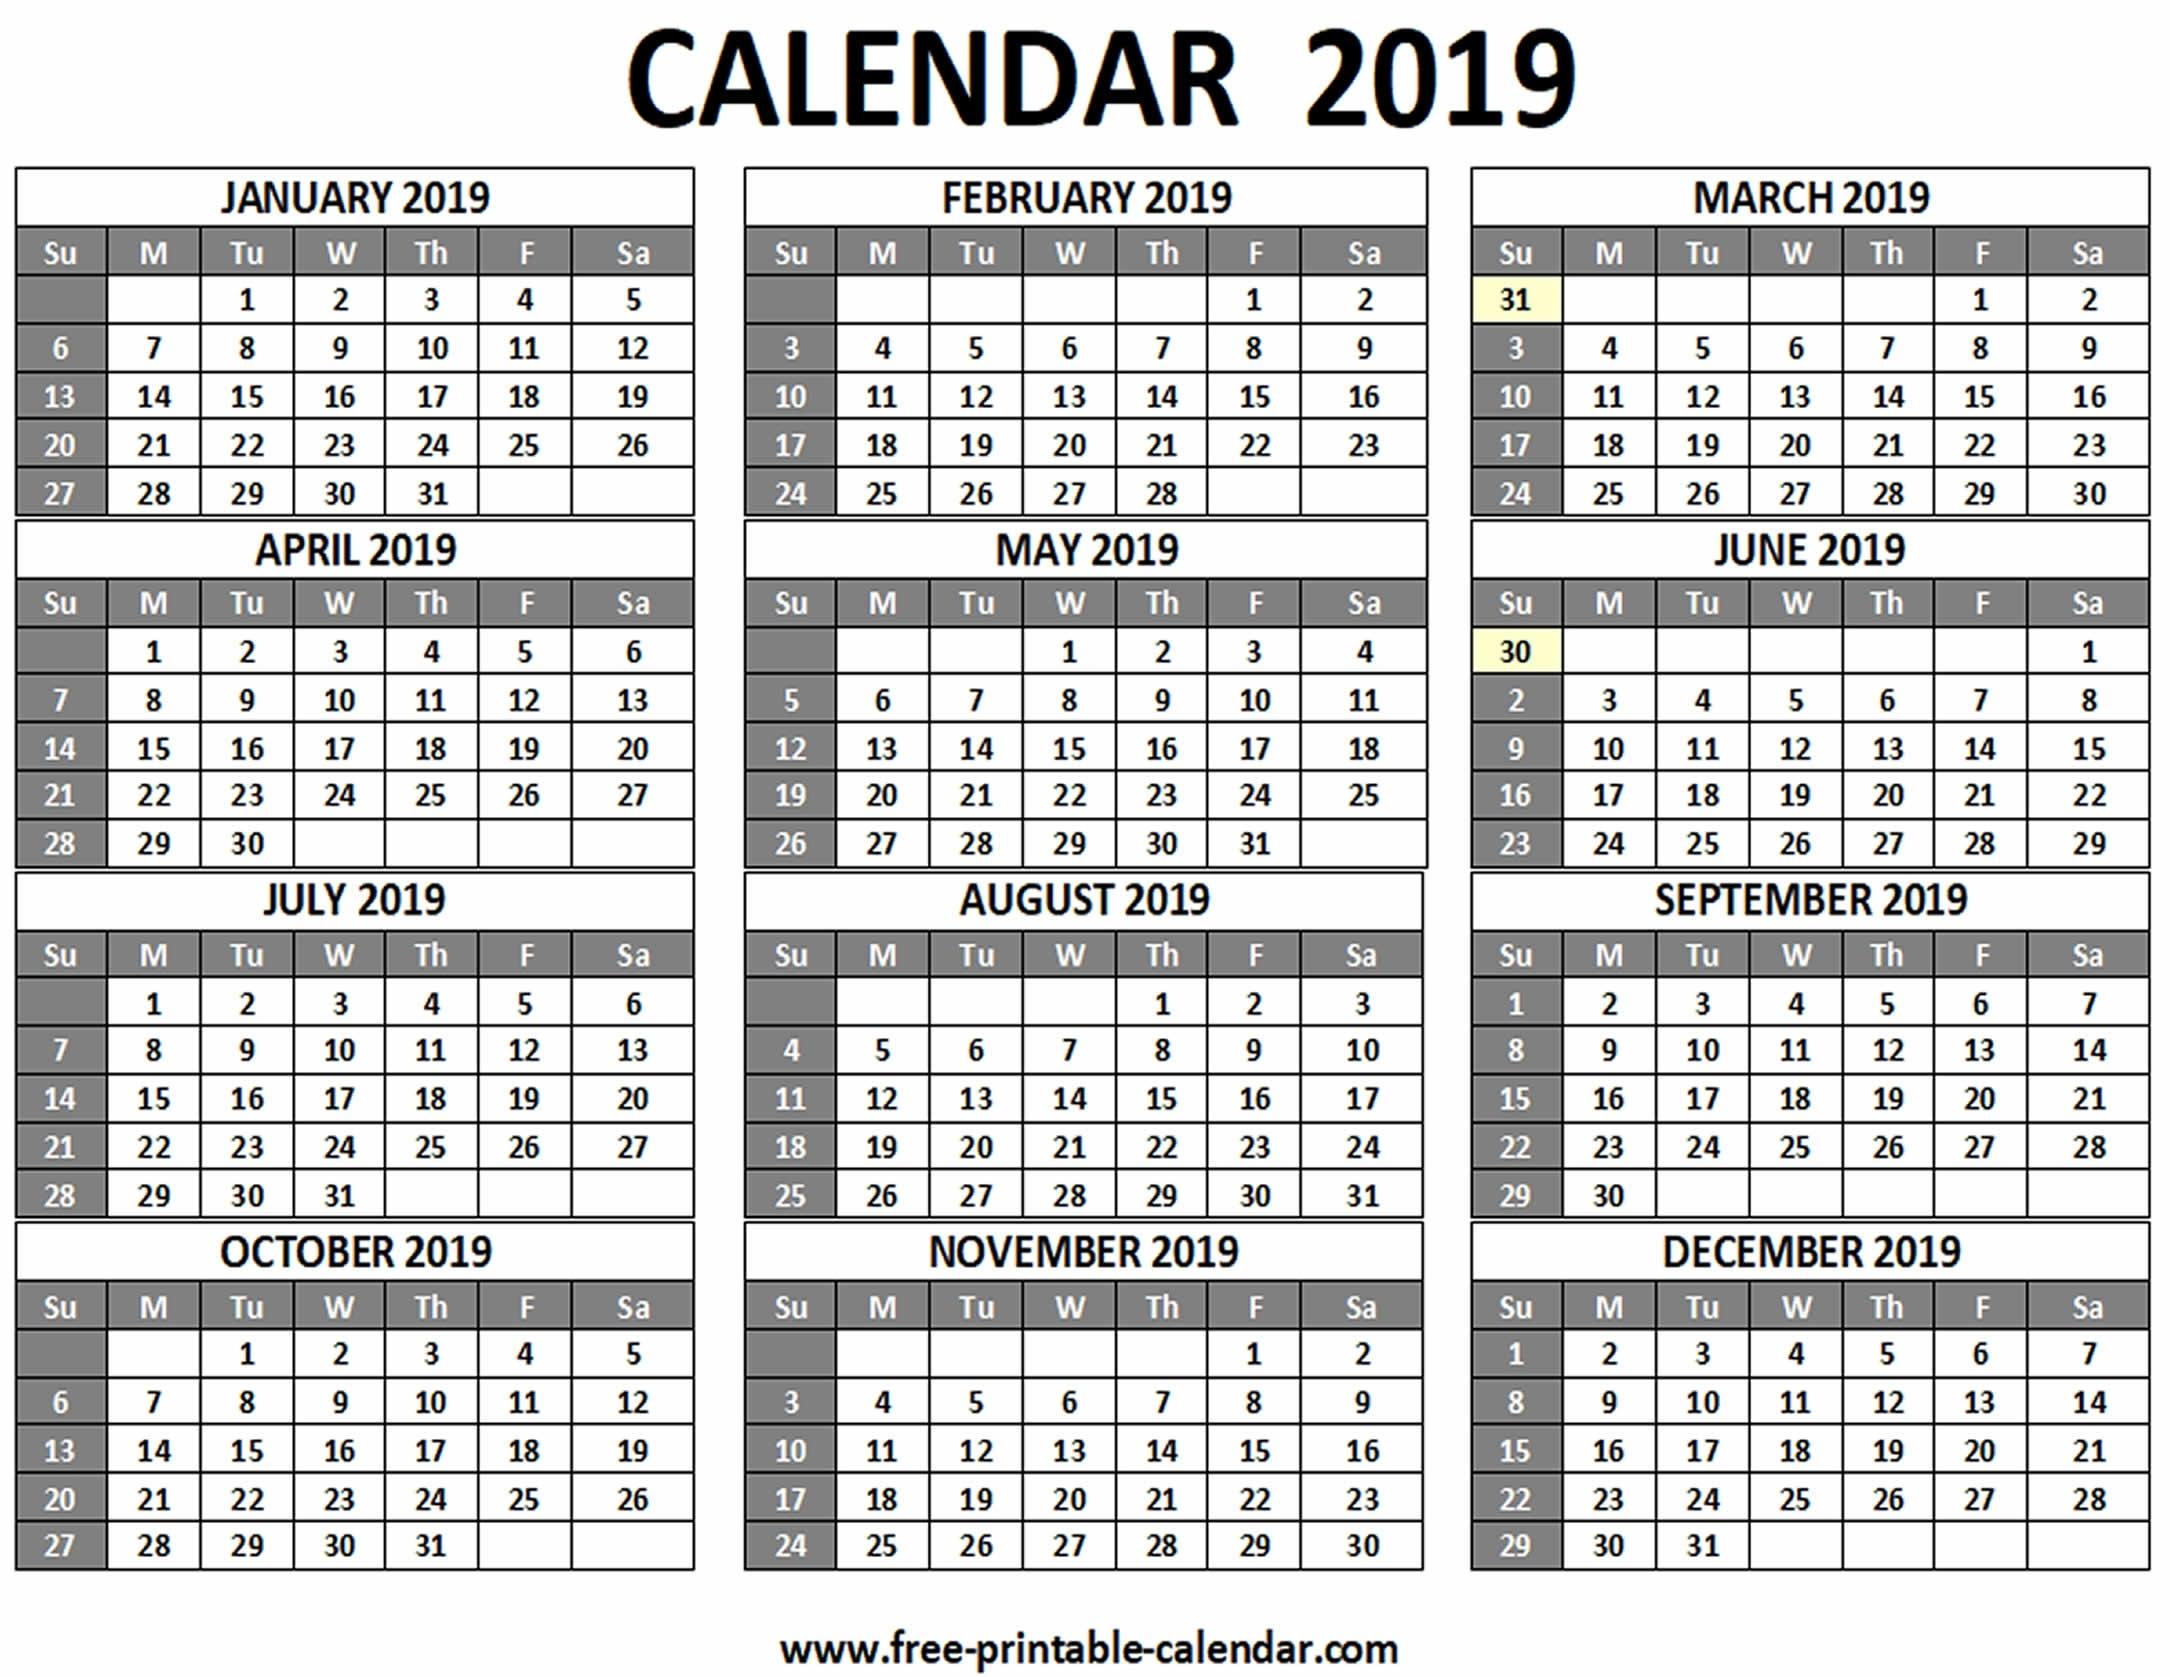 Printable 2019 Calendar - Free-Printable-Calendar